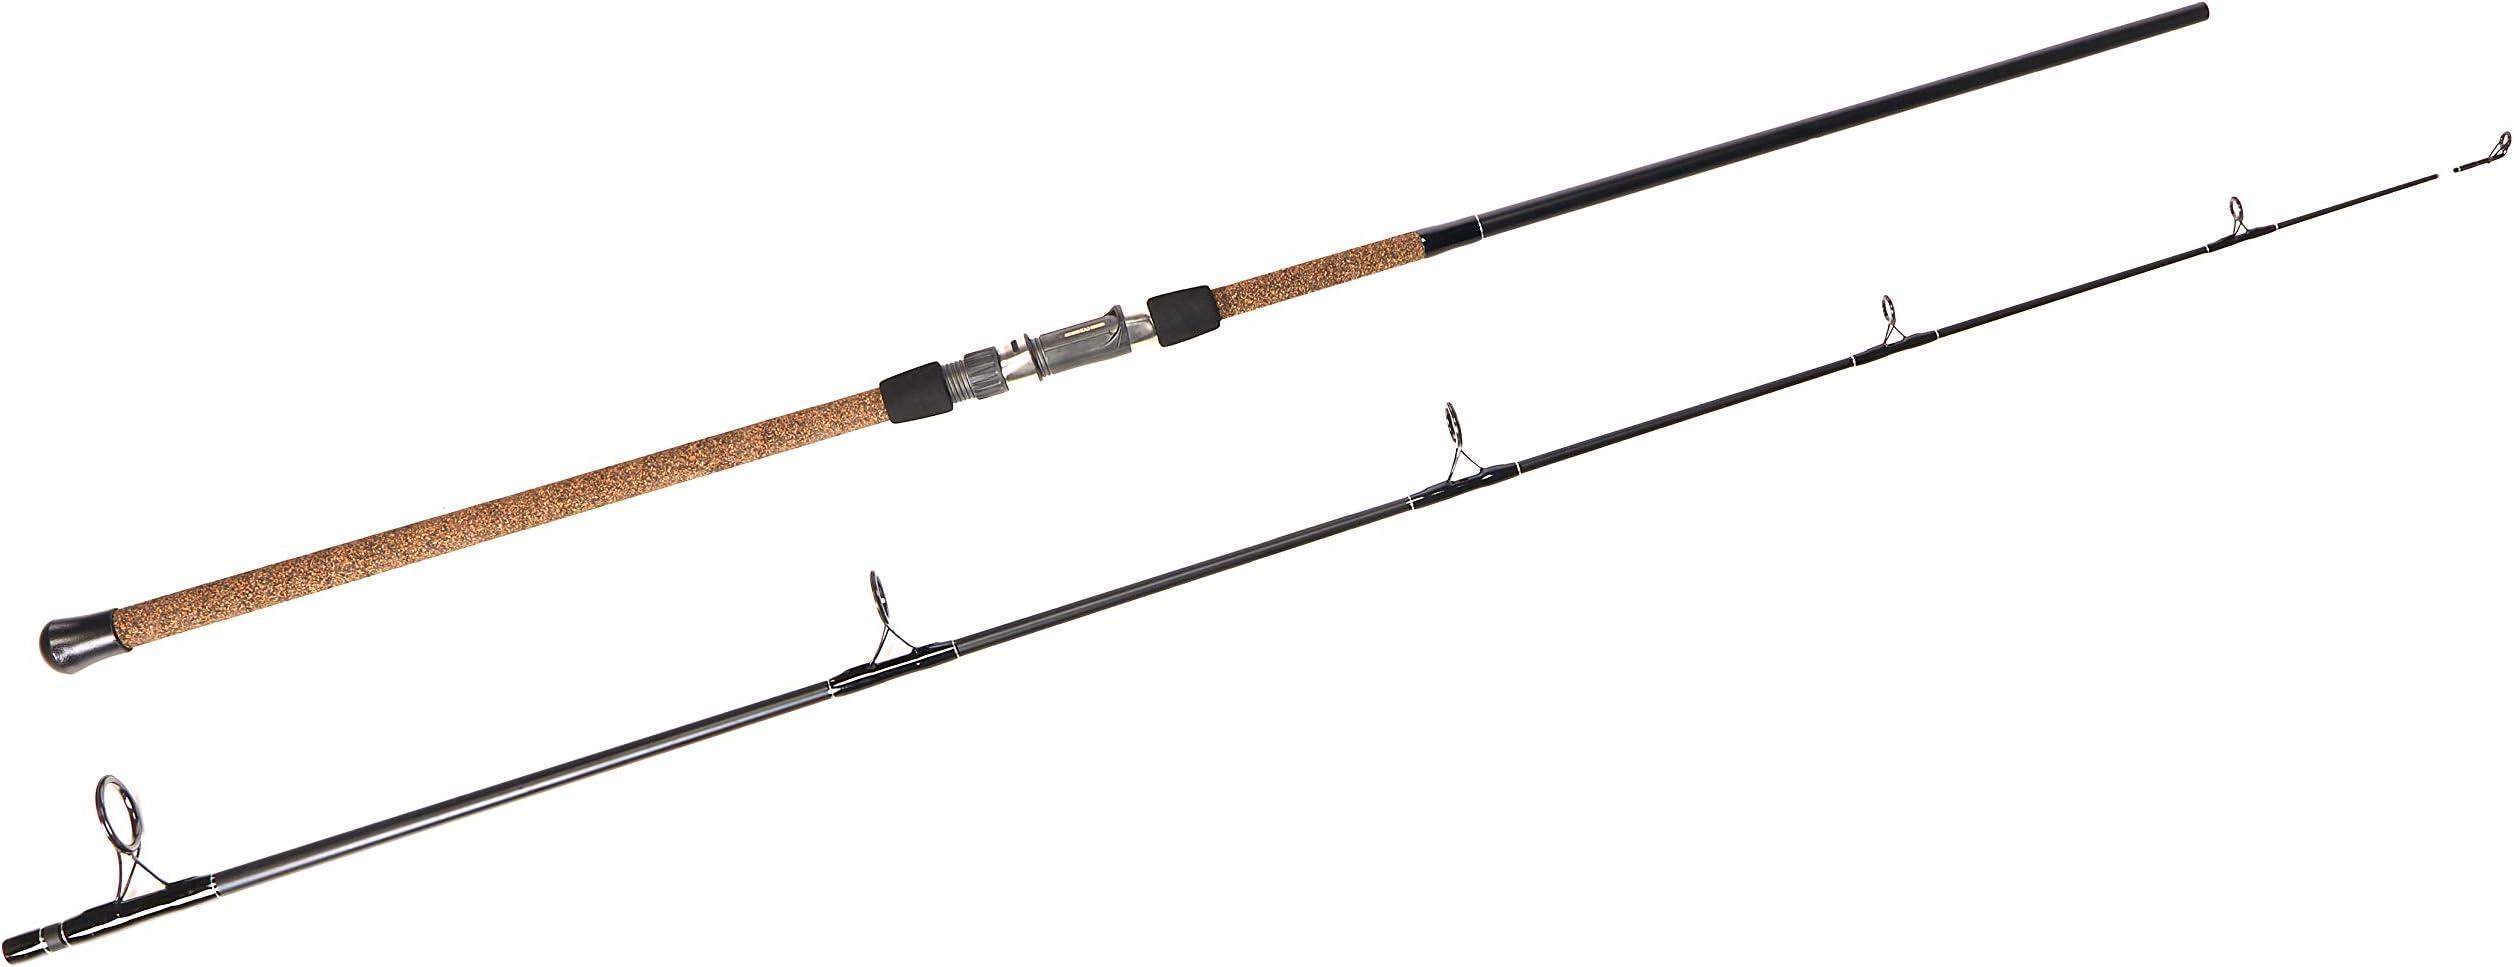 TICA UEHA Surf Spinning Fishing Rod Series